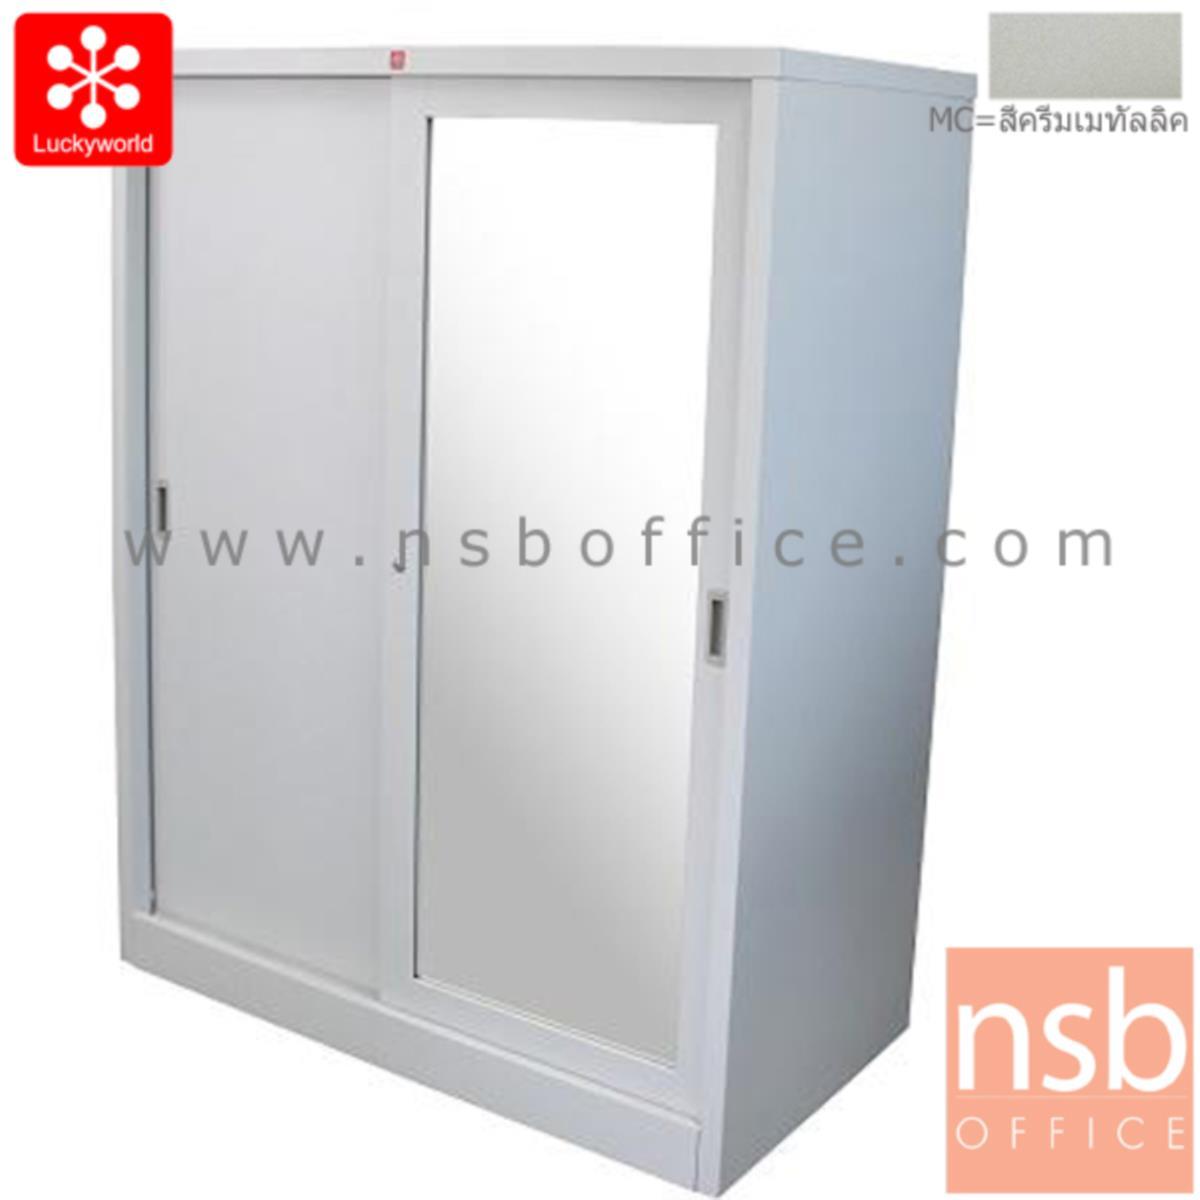 E31A072:ตู้เสื้อผ้าเตี้ย บานเลื่อน บานทึบ/บานกระจกเงา H152.5 cm. KSV-152K-MC